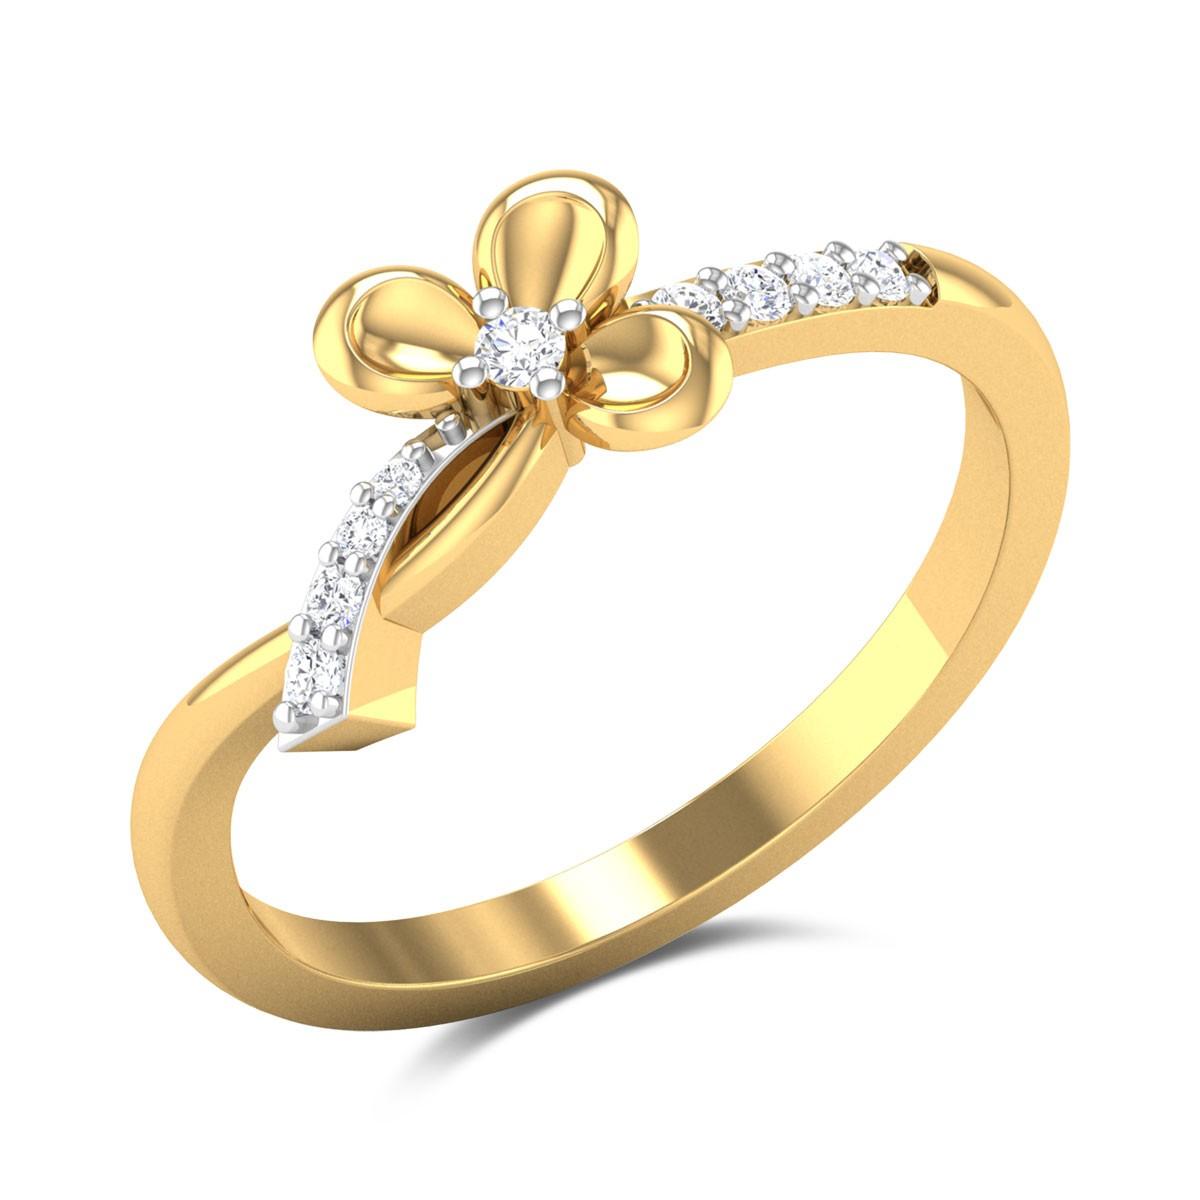 Aahladita Bowed Diamond Ring